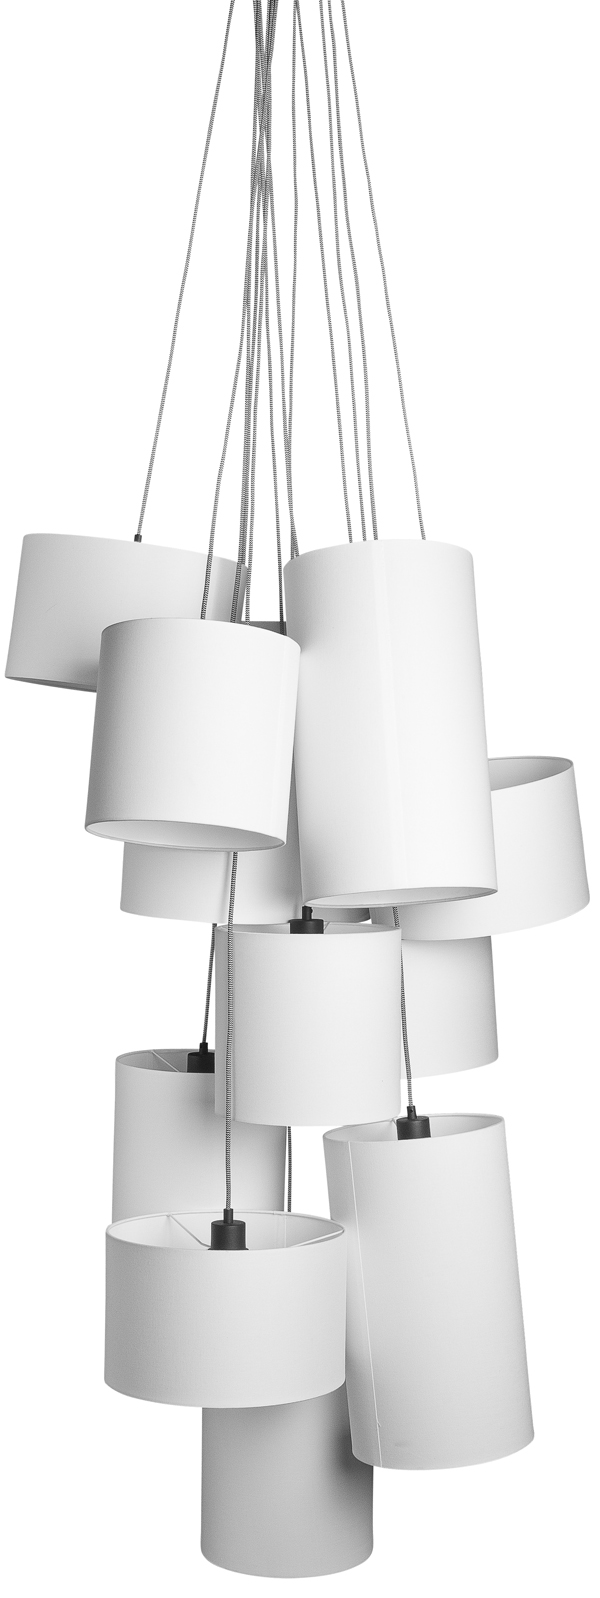 lampa nowoczesna do salonu